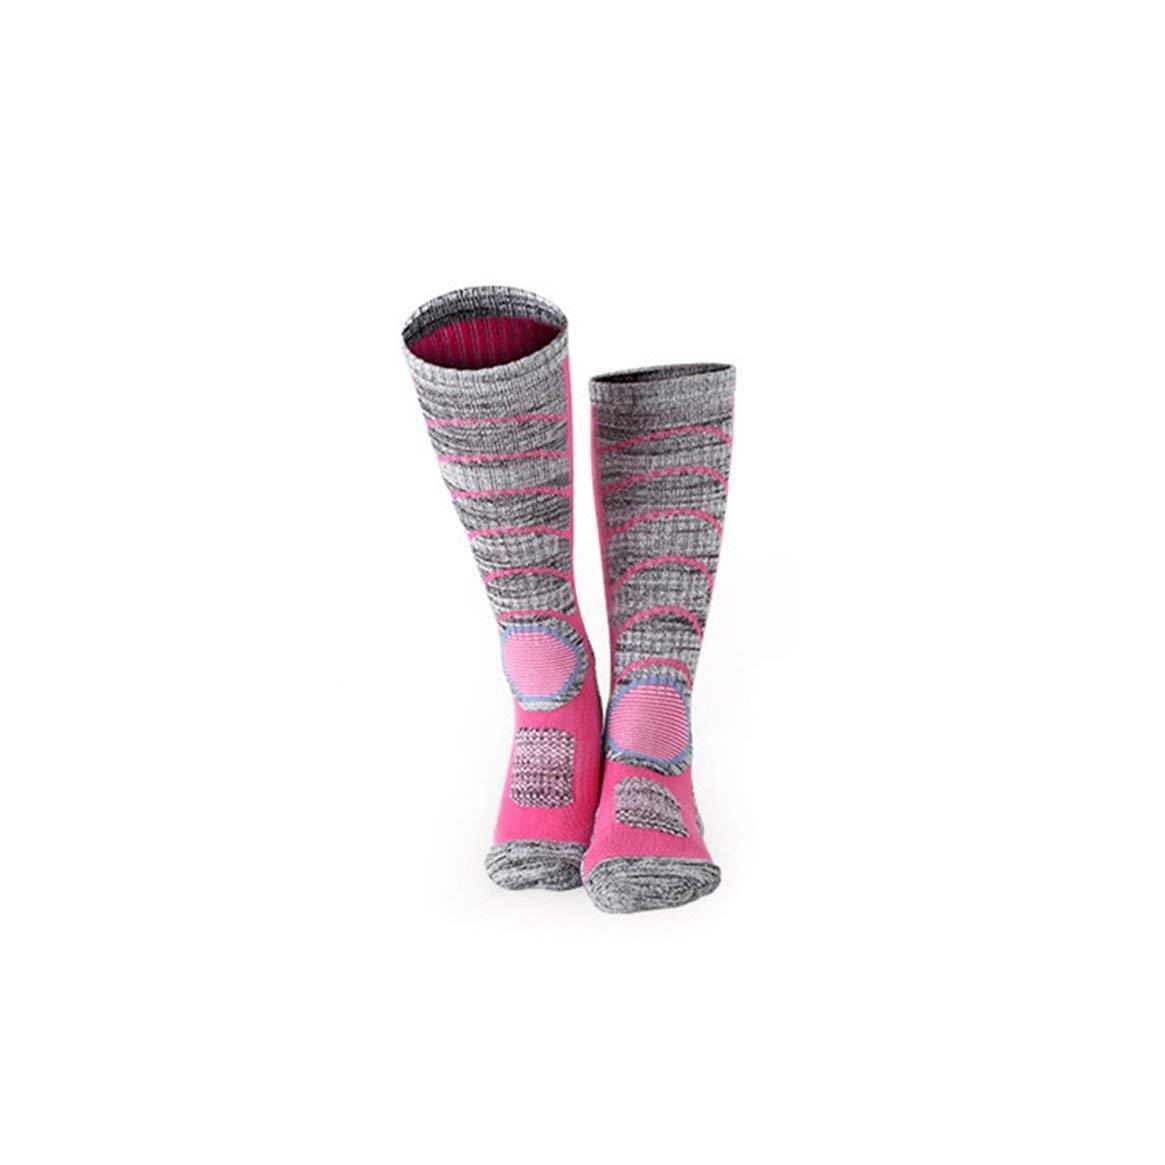 Delicacydex Komfortable Keep Warme Winter Männer Frauen Lange Ski Socken Dicker Baumwolle Outdoor Sports Snowboard Klettern Wandern Socken - Rose Red